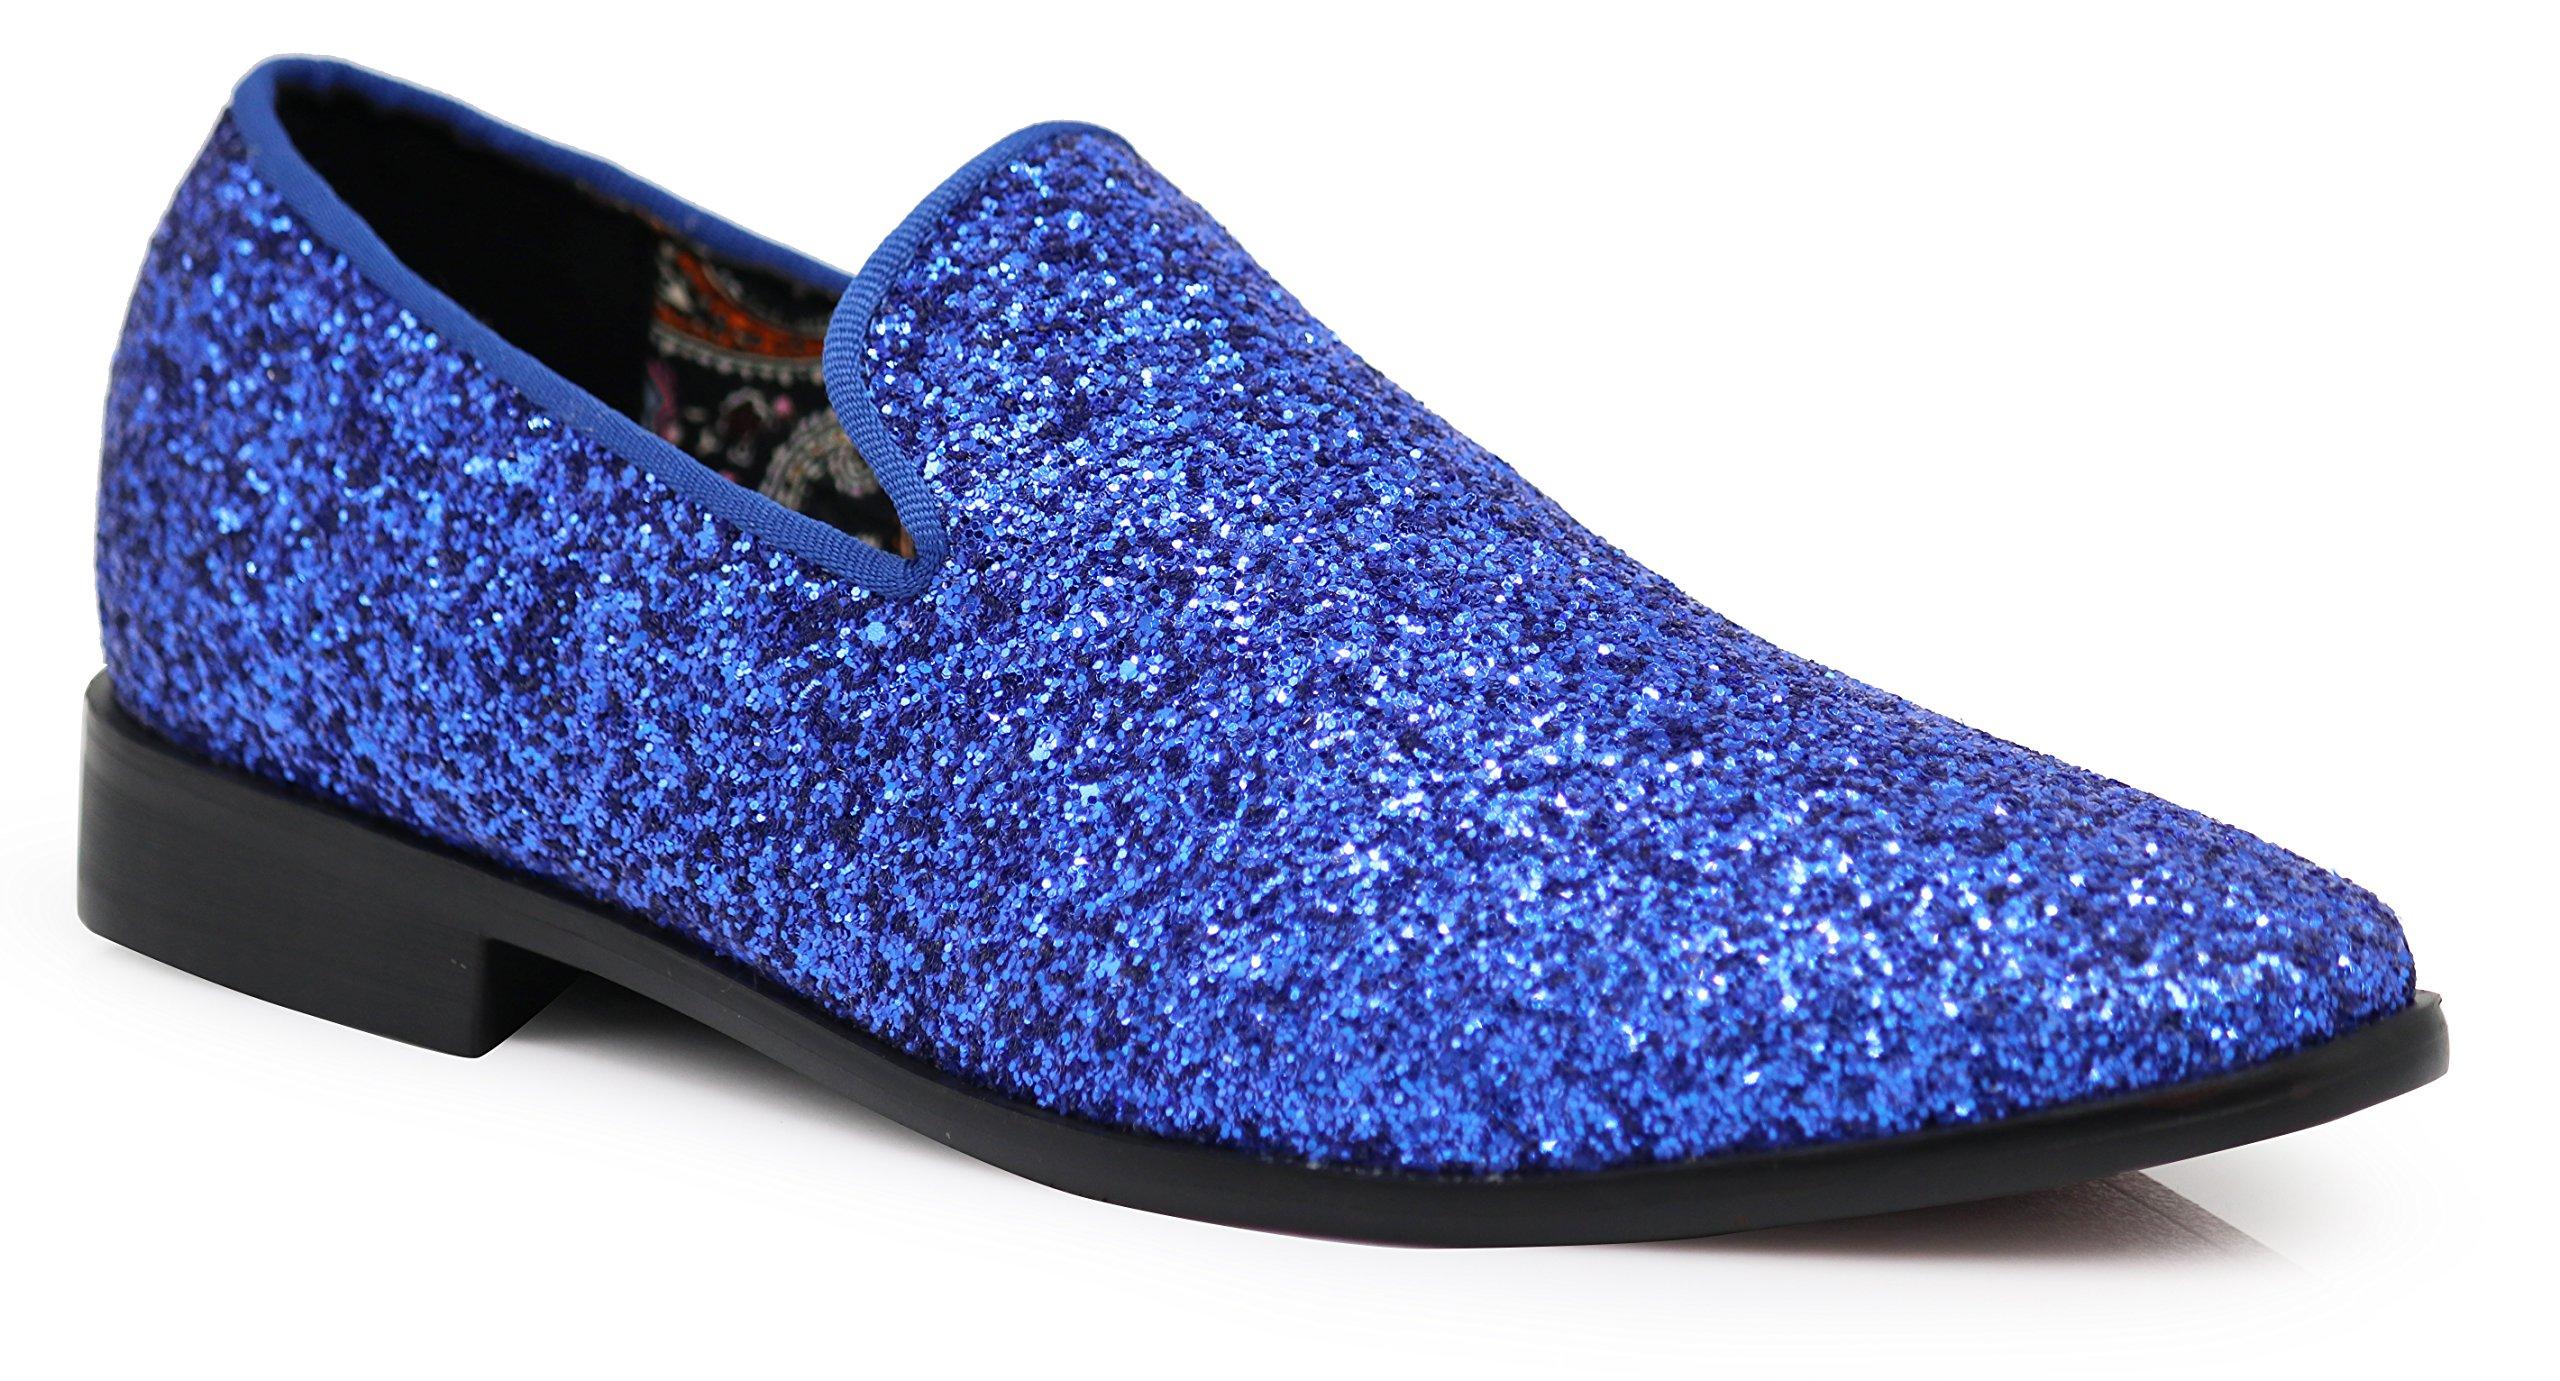 Enzo Romeo SPK04 Men's Vintage Glitter Dress Loafers Slip On Shoes Classic Tuxedo Dress Shoes (9.5, Royal Blue)